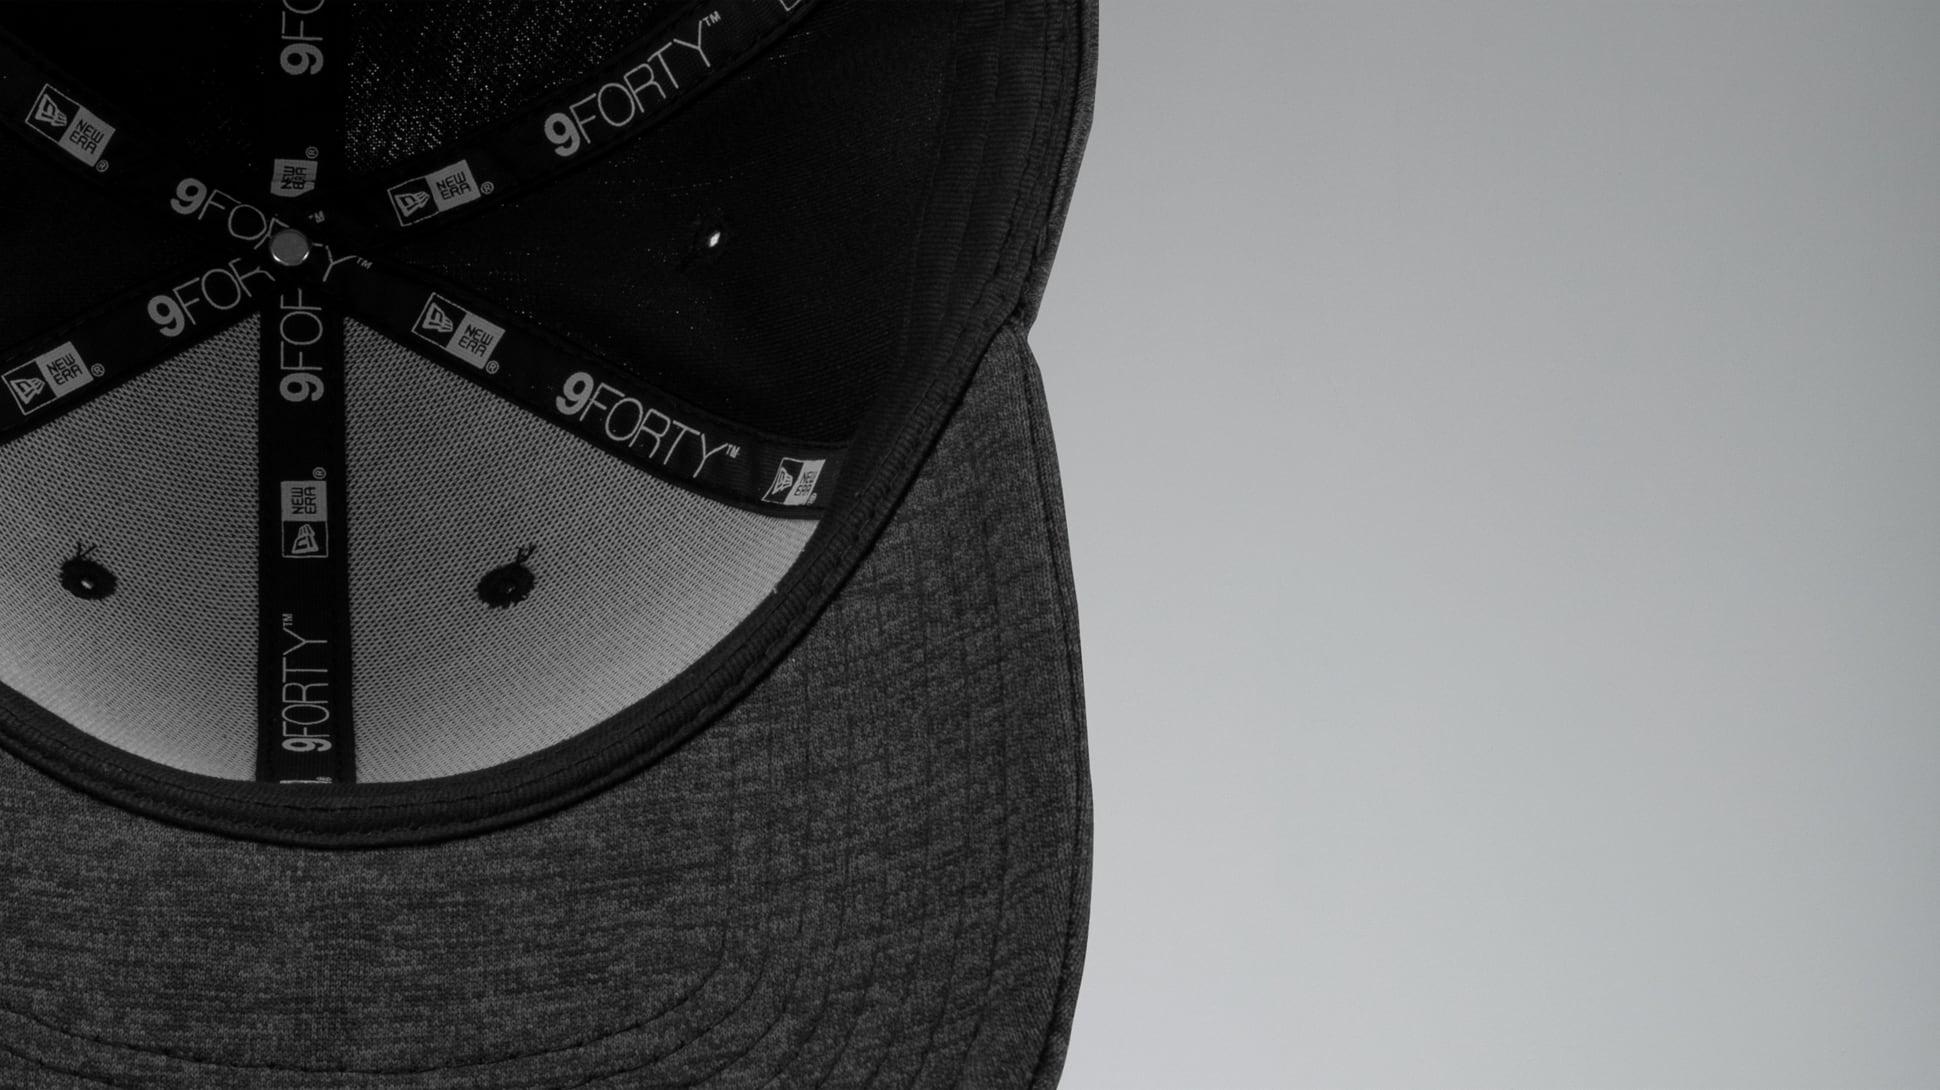 Minimalist 9FORTY Cap Image 5